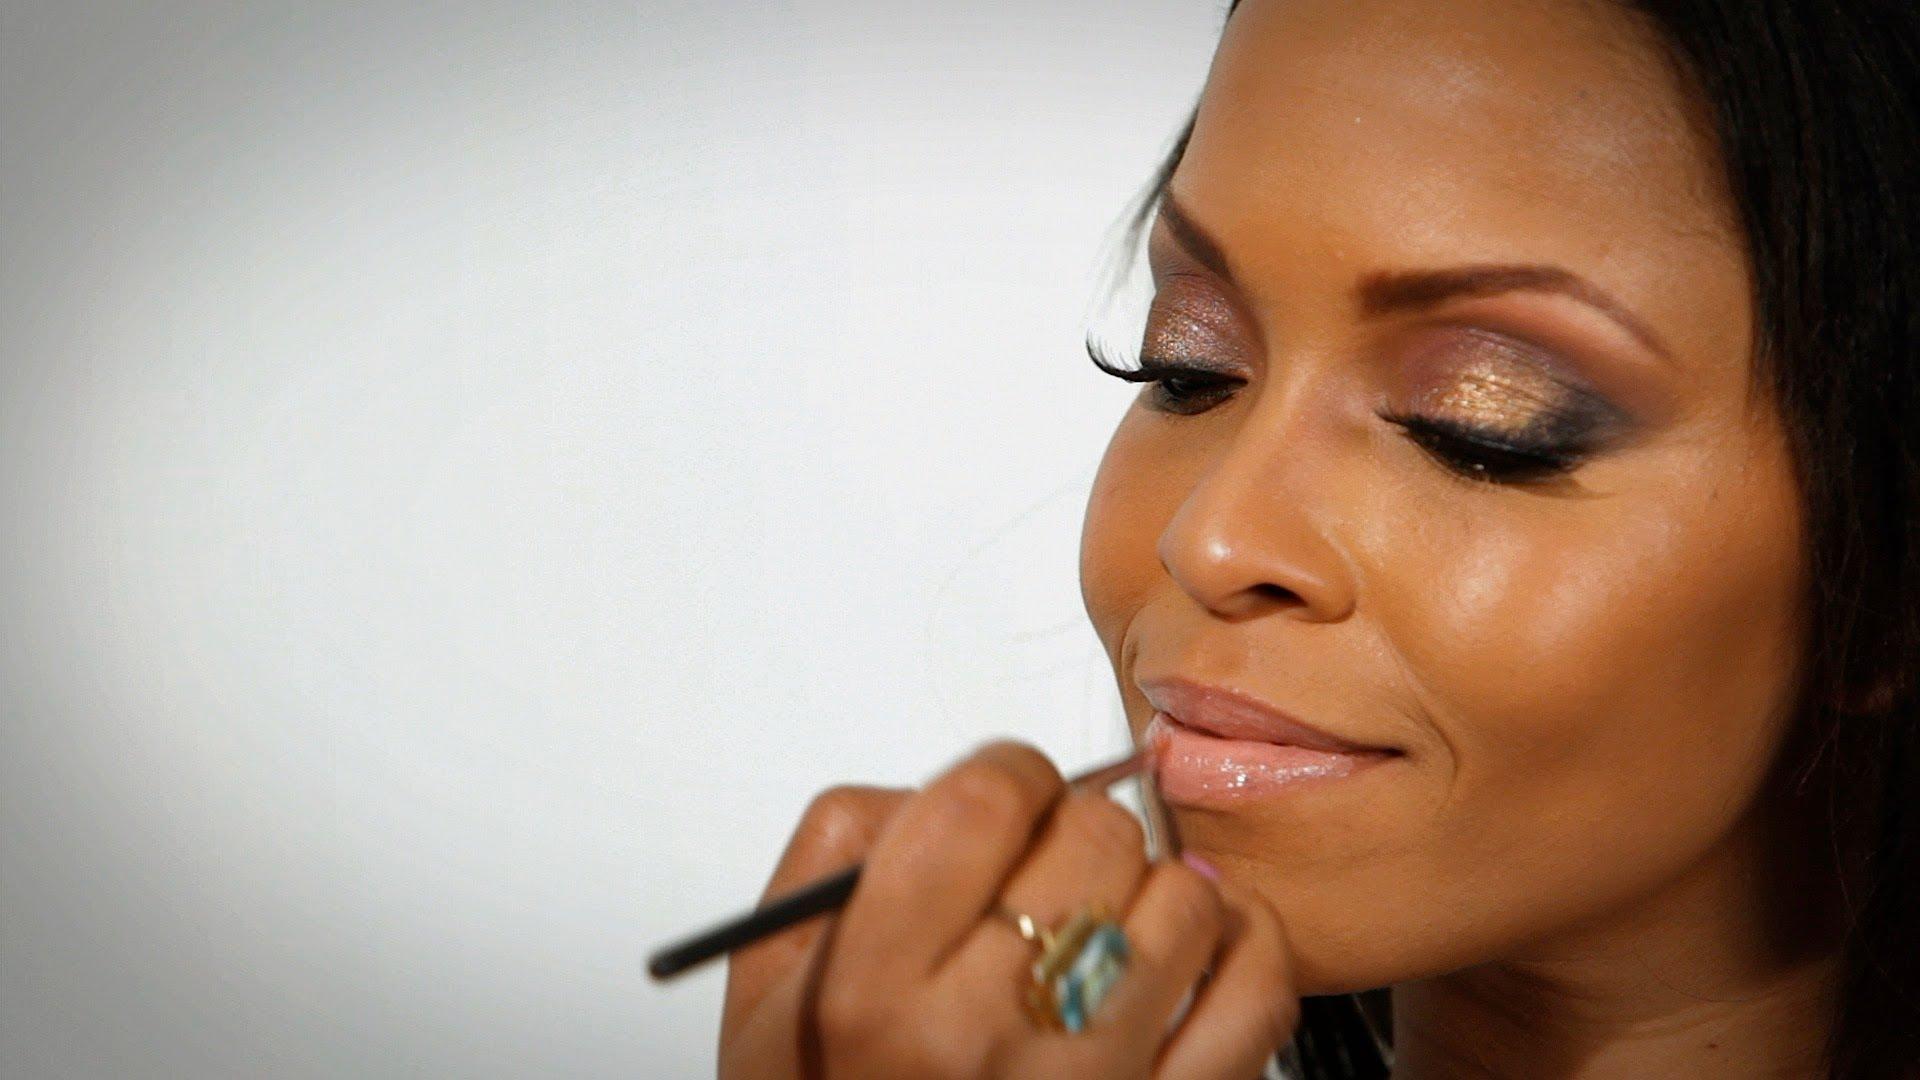 kosmetik online kaufen dame